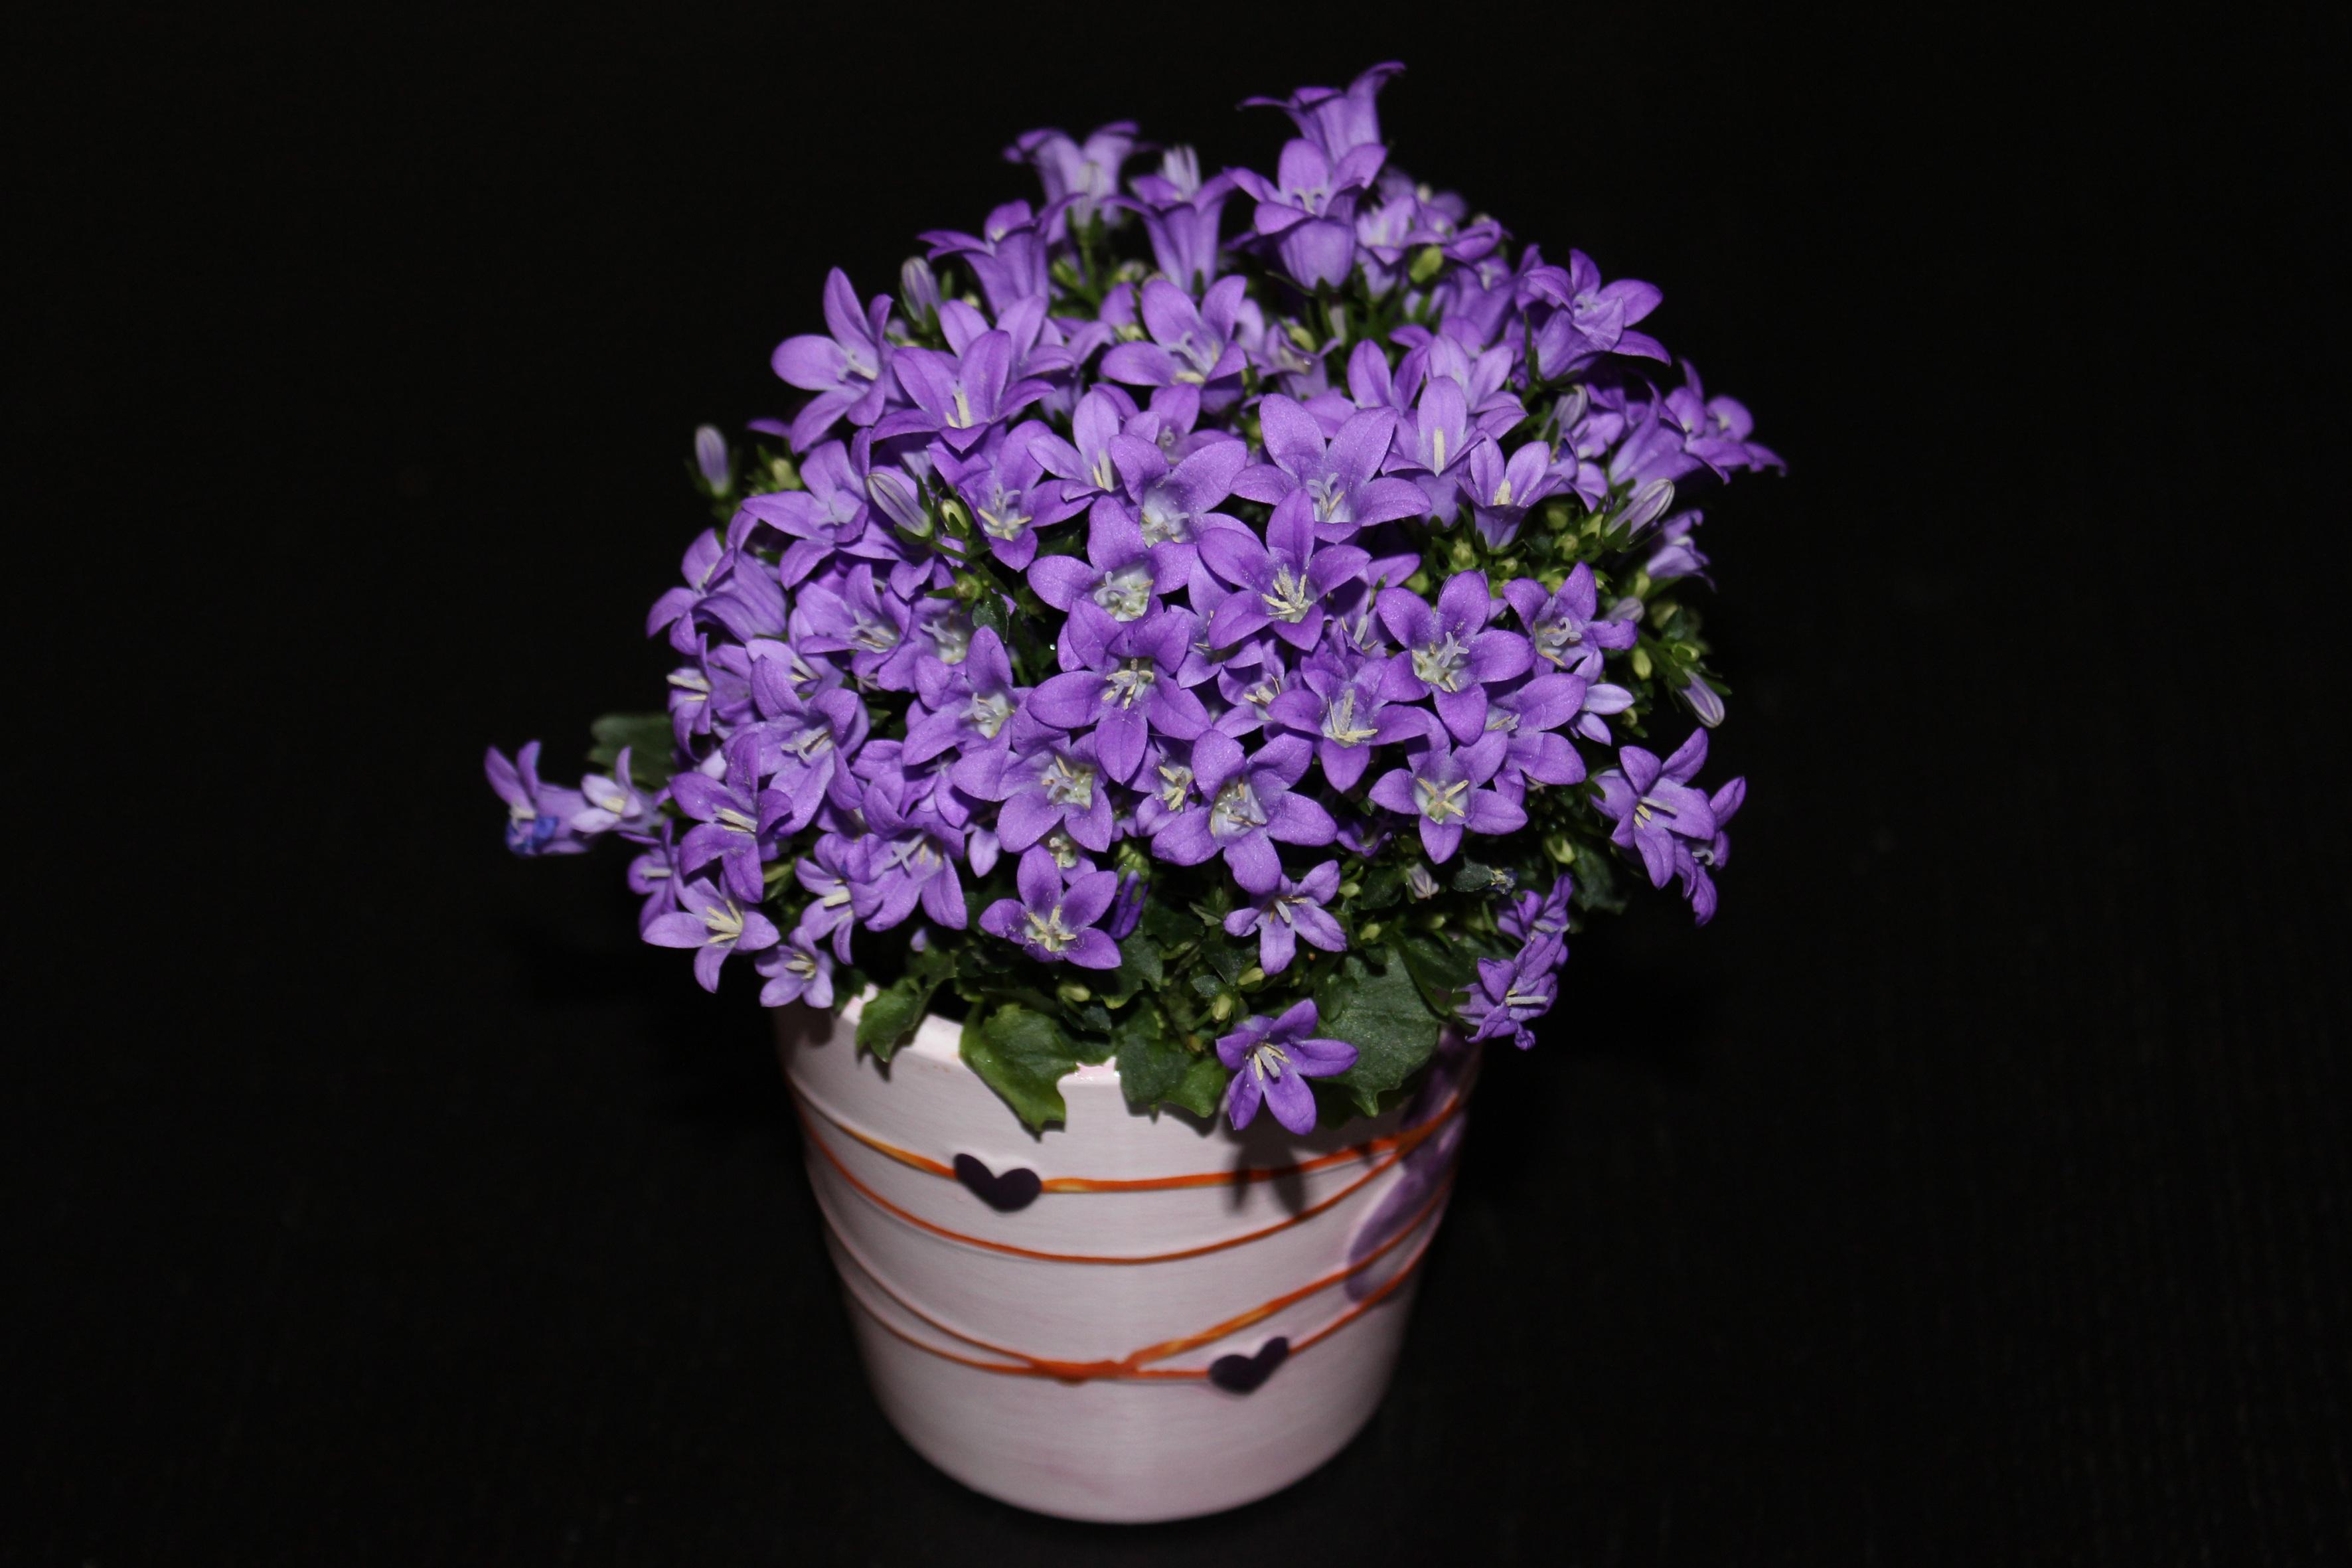 Free images purple petal flora flowers violet lilac plant flower purple petal flora lavender flowers violet lilac floristry hyacinth macro photography flowering plant flower dhlflorist Choice Image